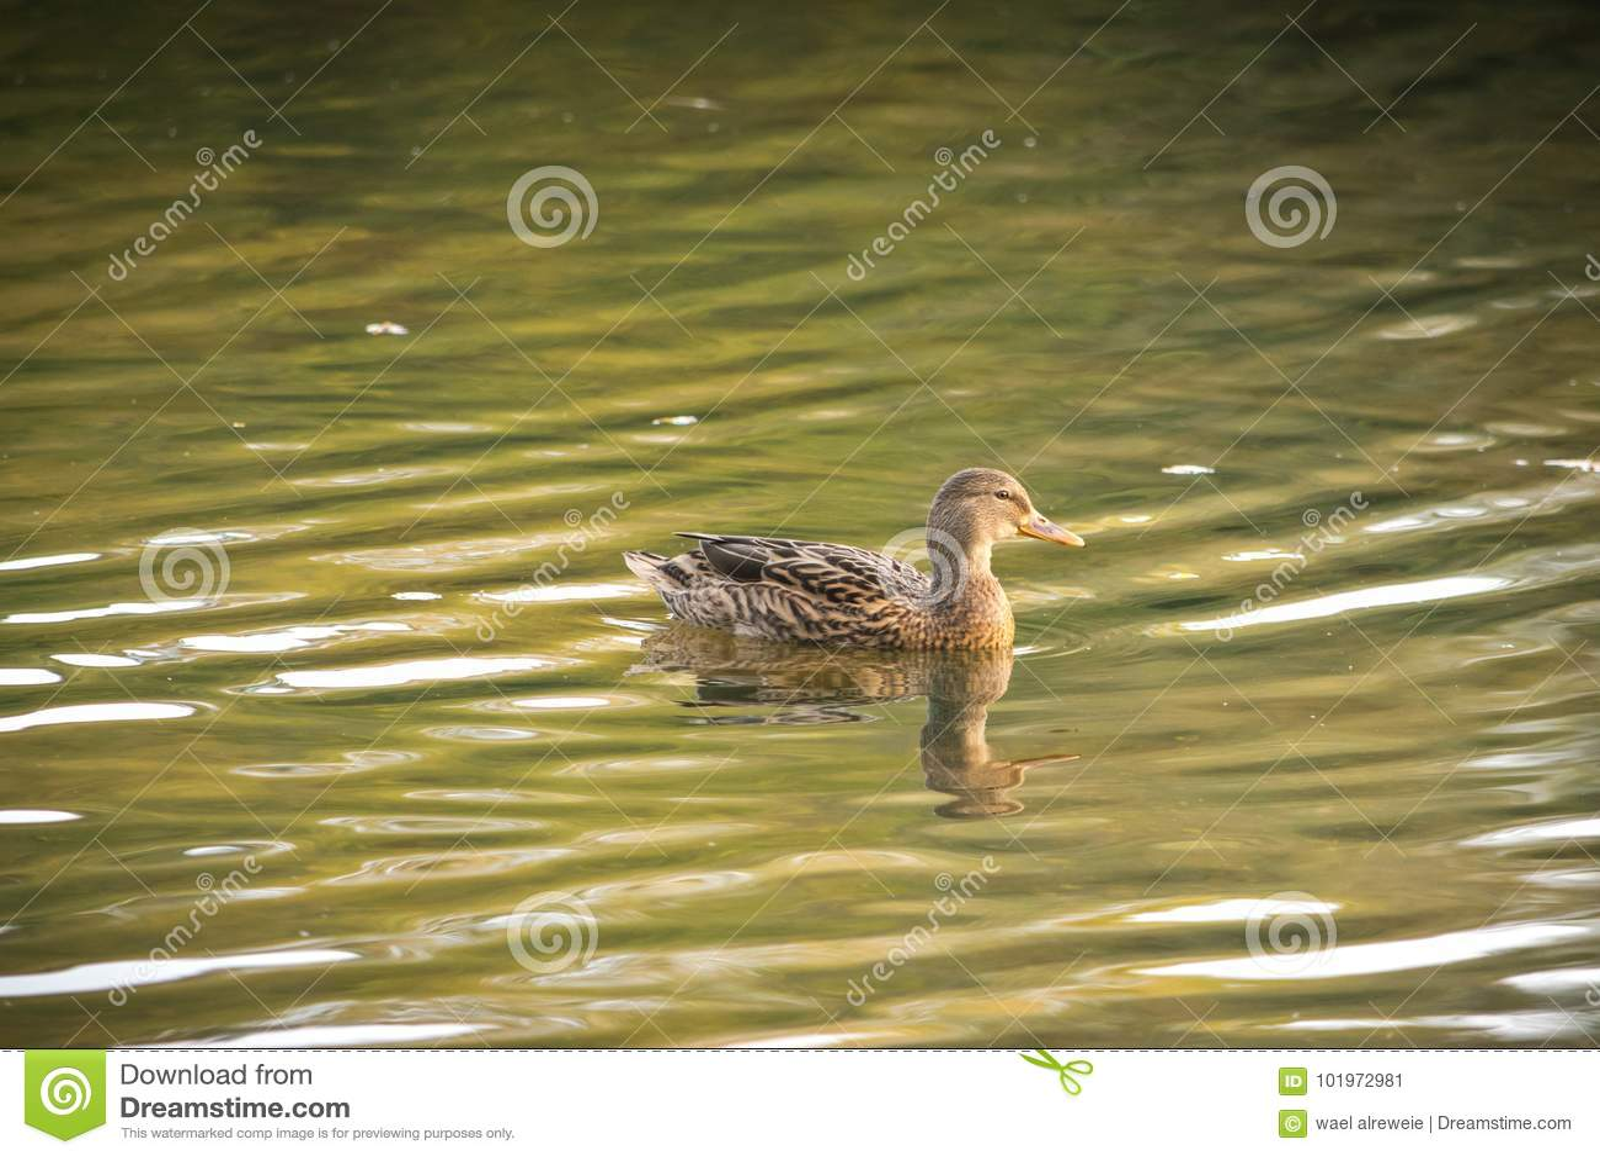 Anas Strepera, θηλυκή πάπια φλυαρόπαπιων που κολυμπούν στο νερό λιμνών των λιμνών Ryton, UK